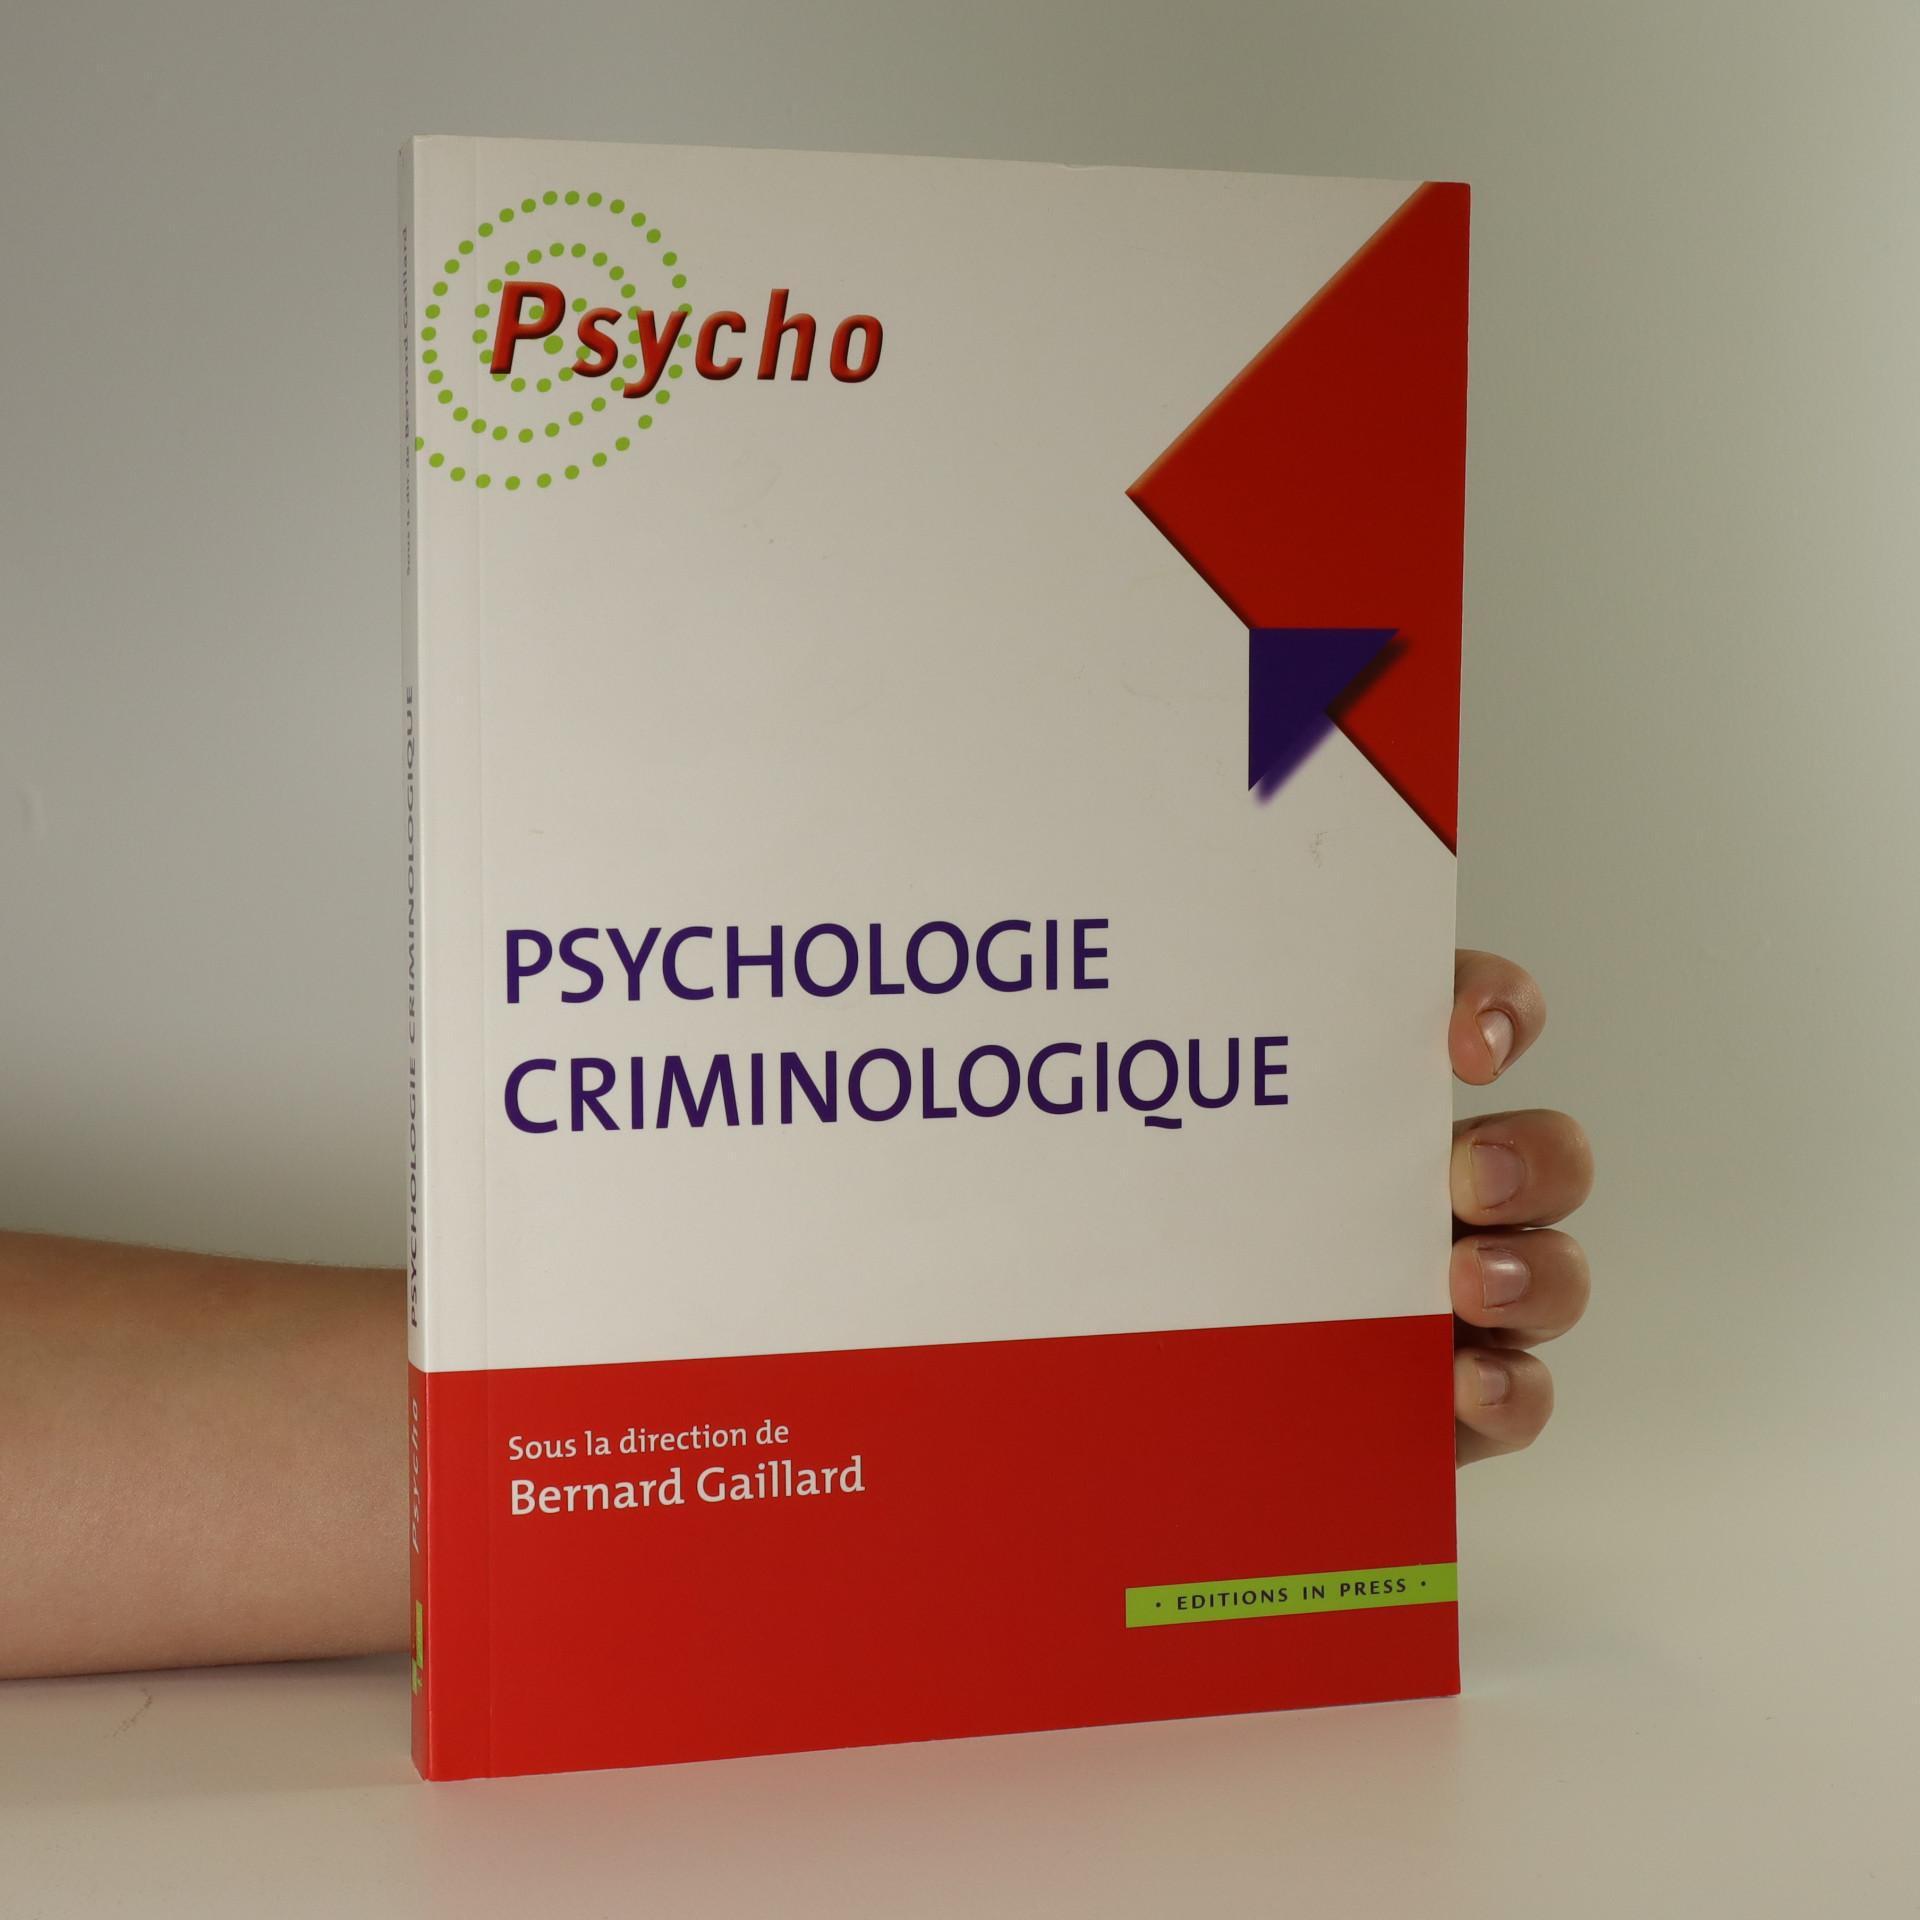 antikvární kniha Psychologie Criminologique, neuveden